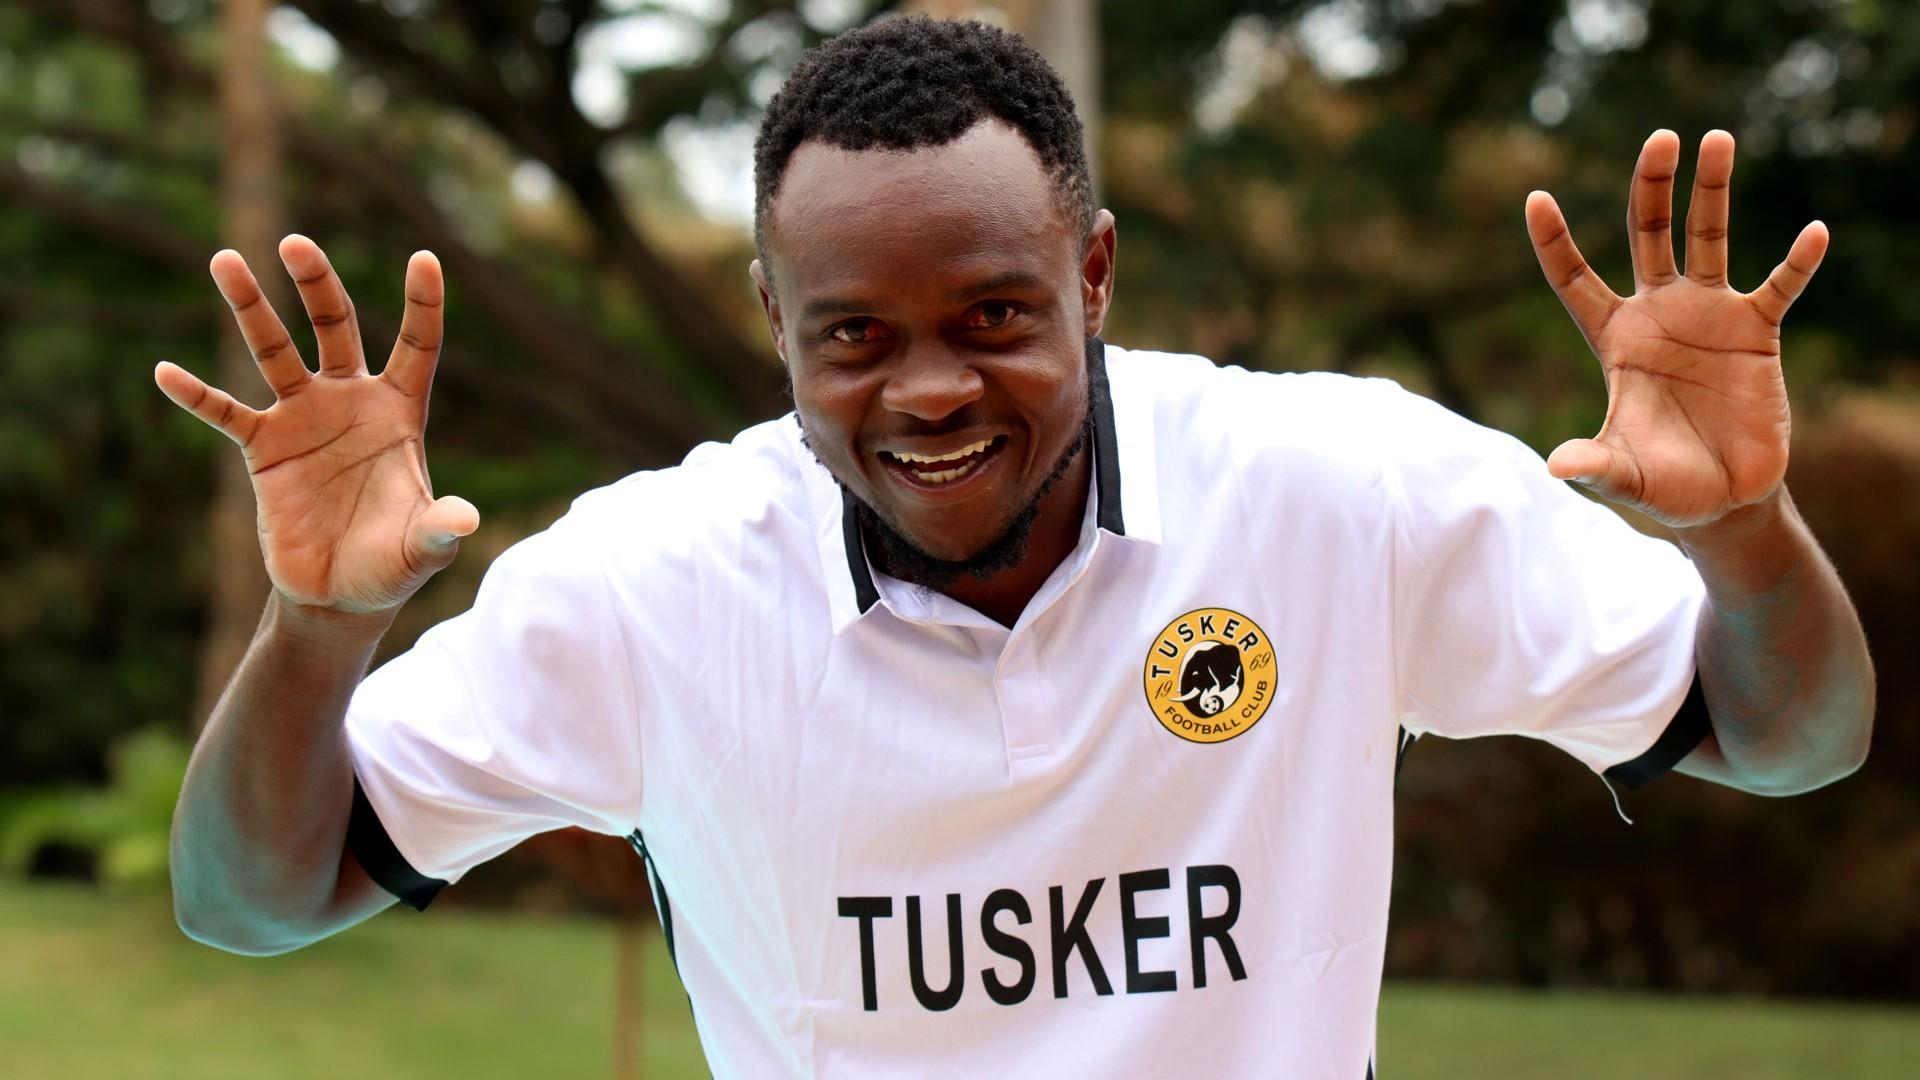 Tusker will face Fifa wrath and pay dearly for tapping Kibwana up – Kakamega Homeboyz chairman Shimanyula